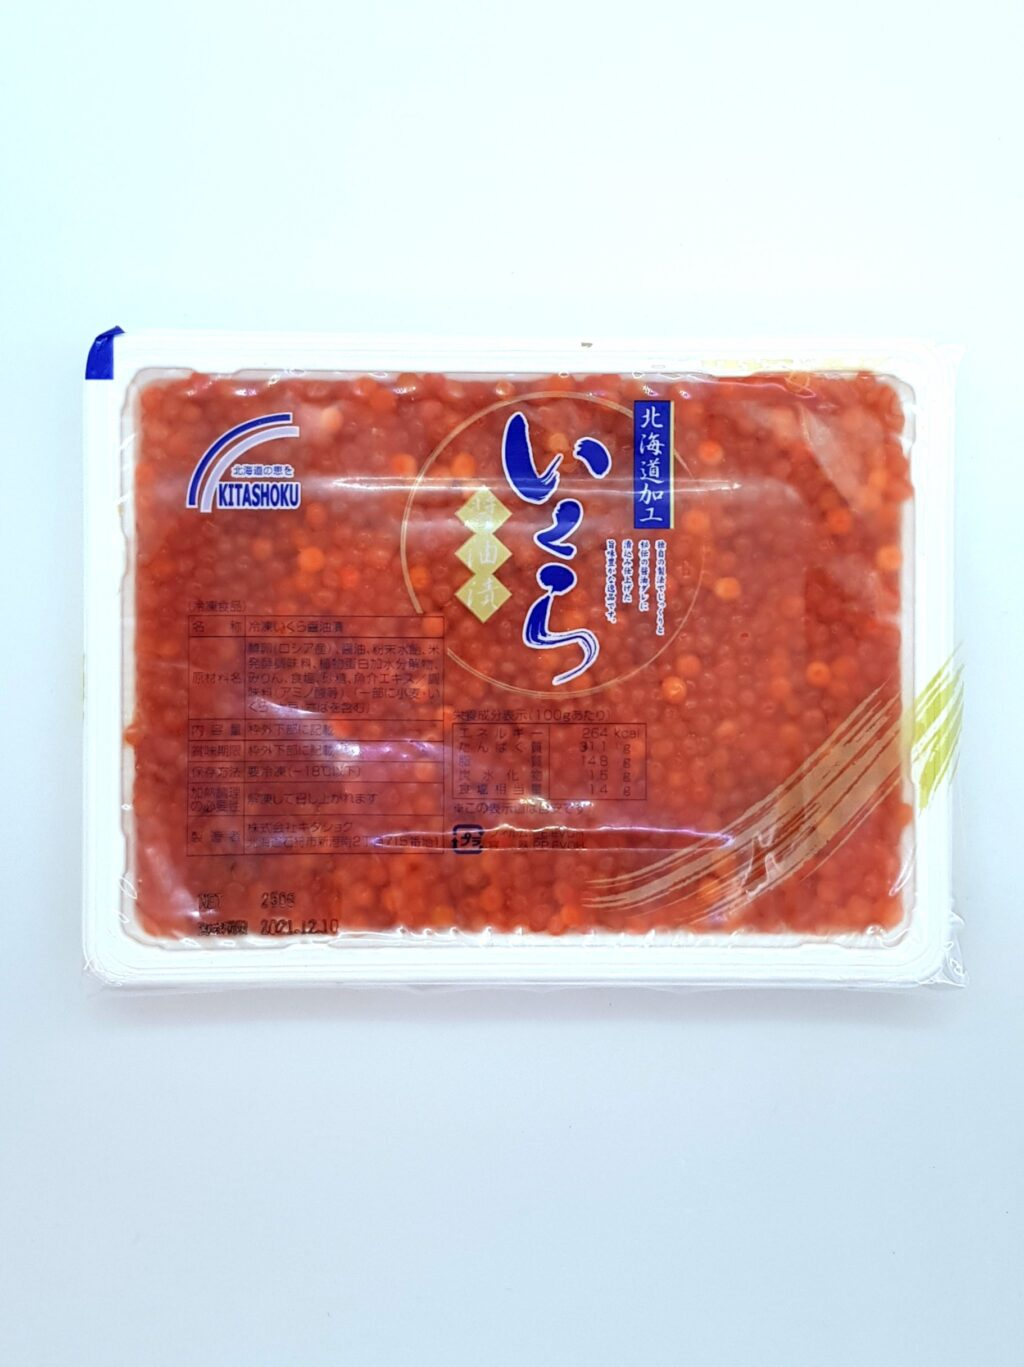 Shiki delivery singapore ikura fish roe shoyu roe Salmon roe trout